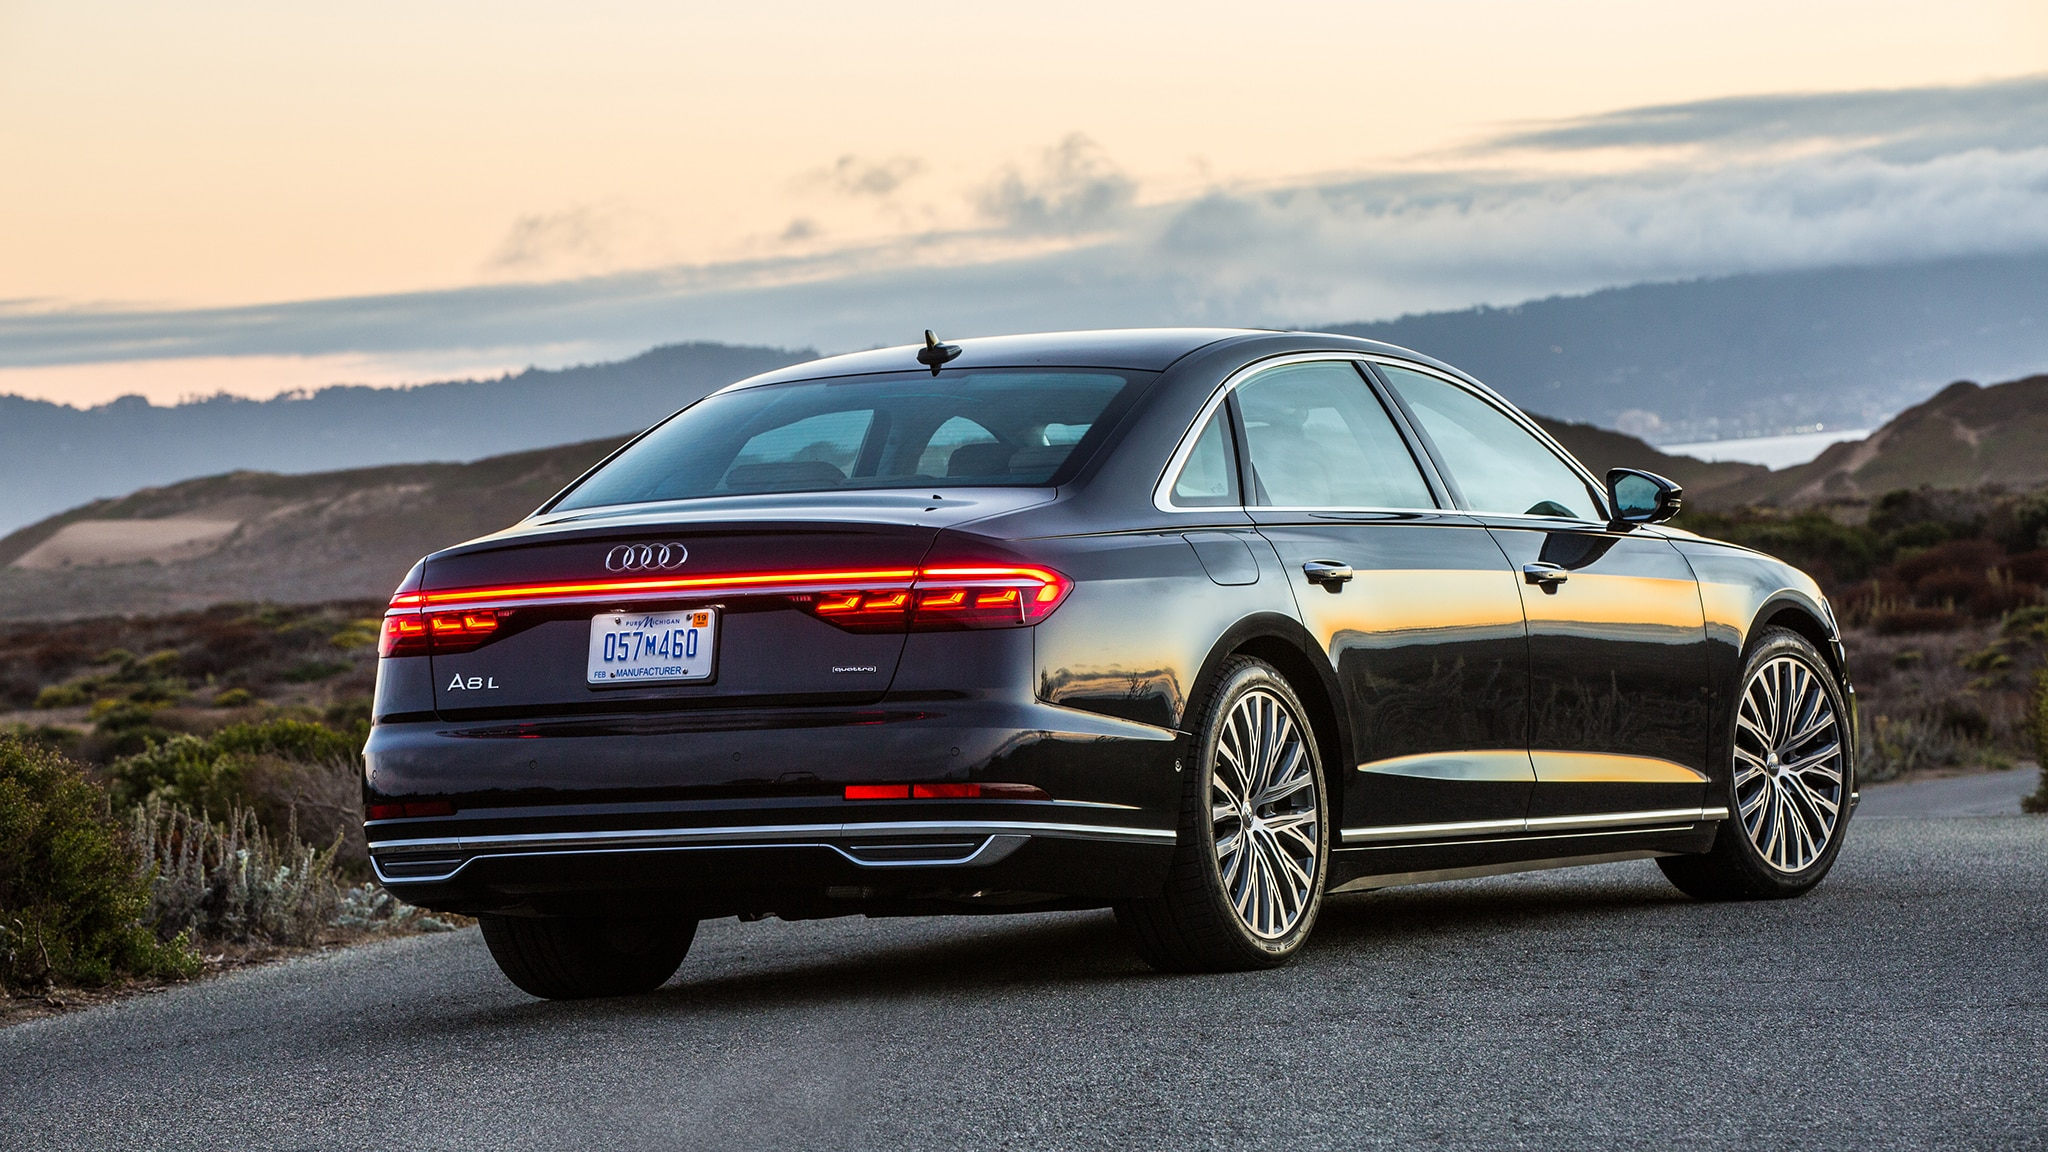 2019 Audi A8 First Drive Review Automobile Magazine | Car